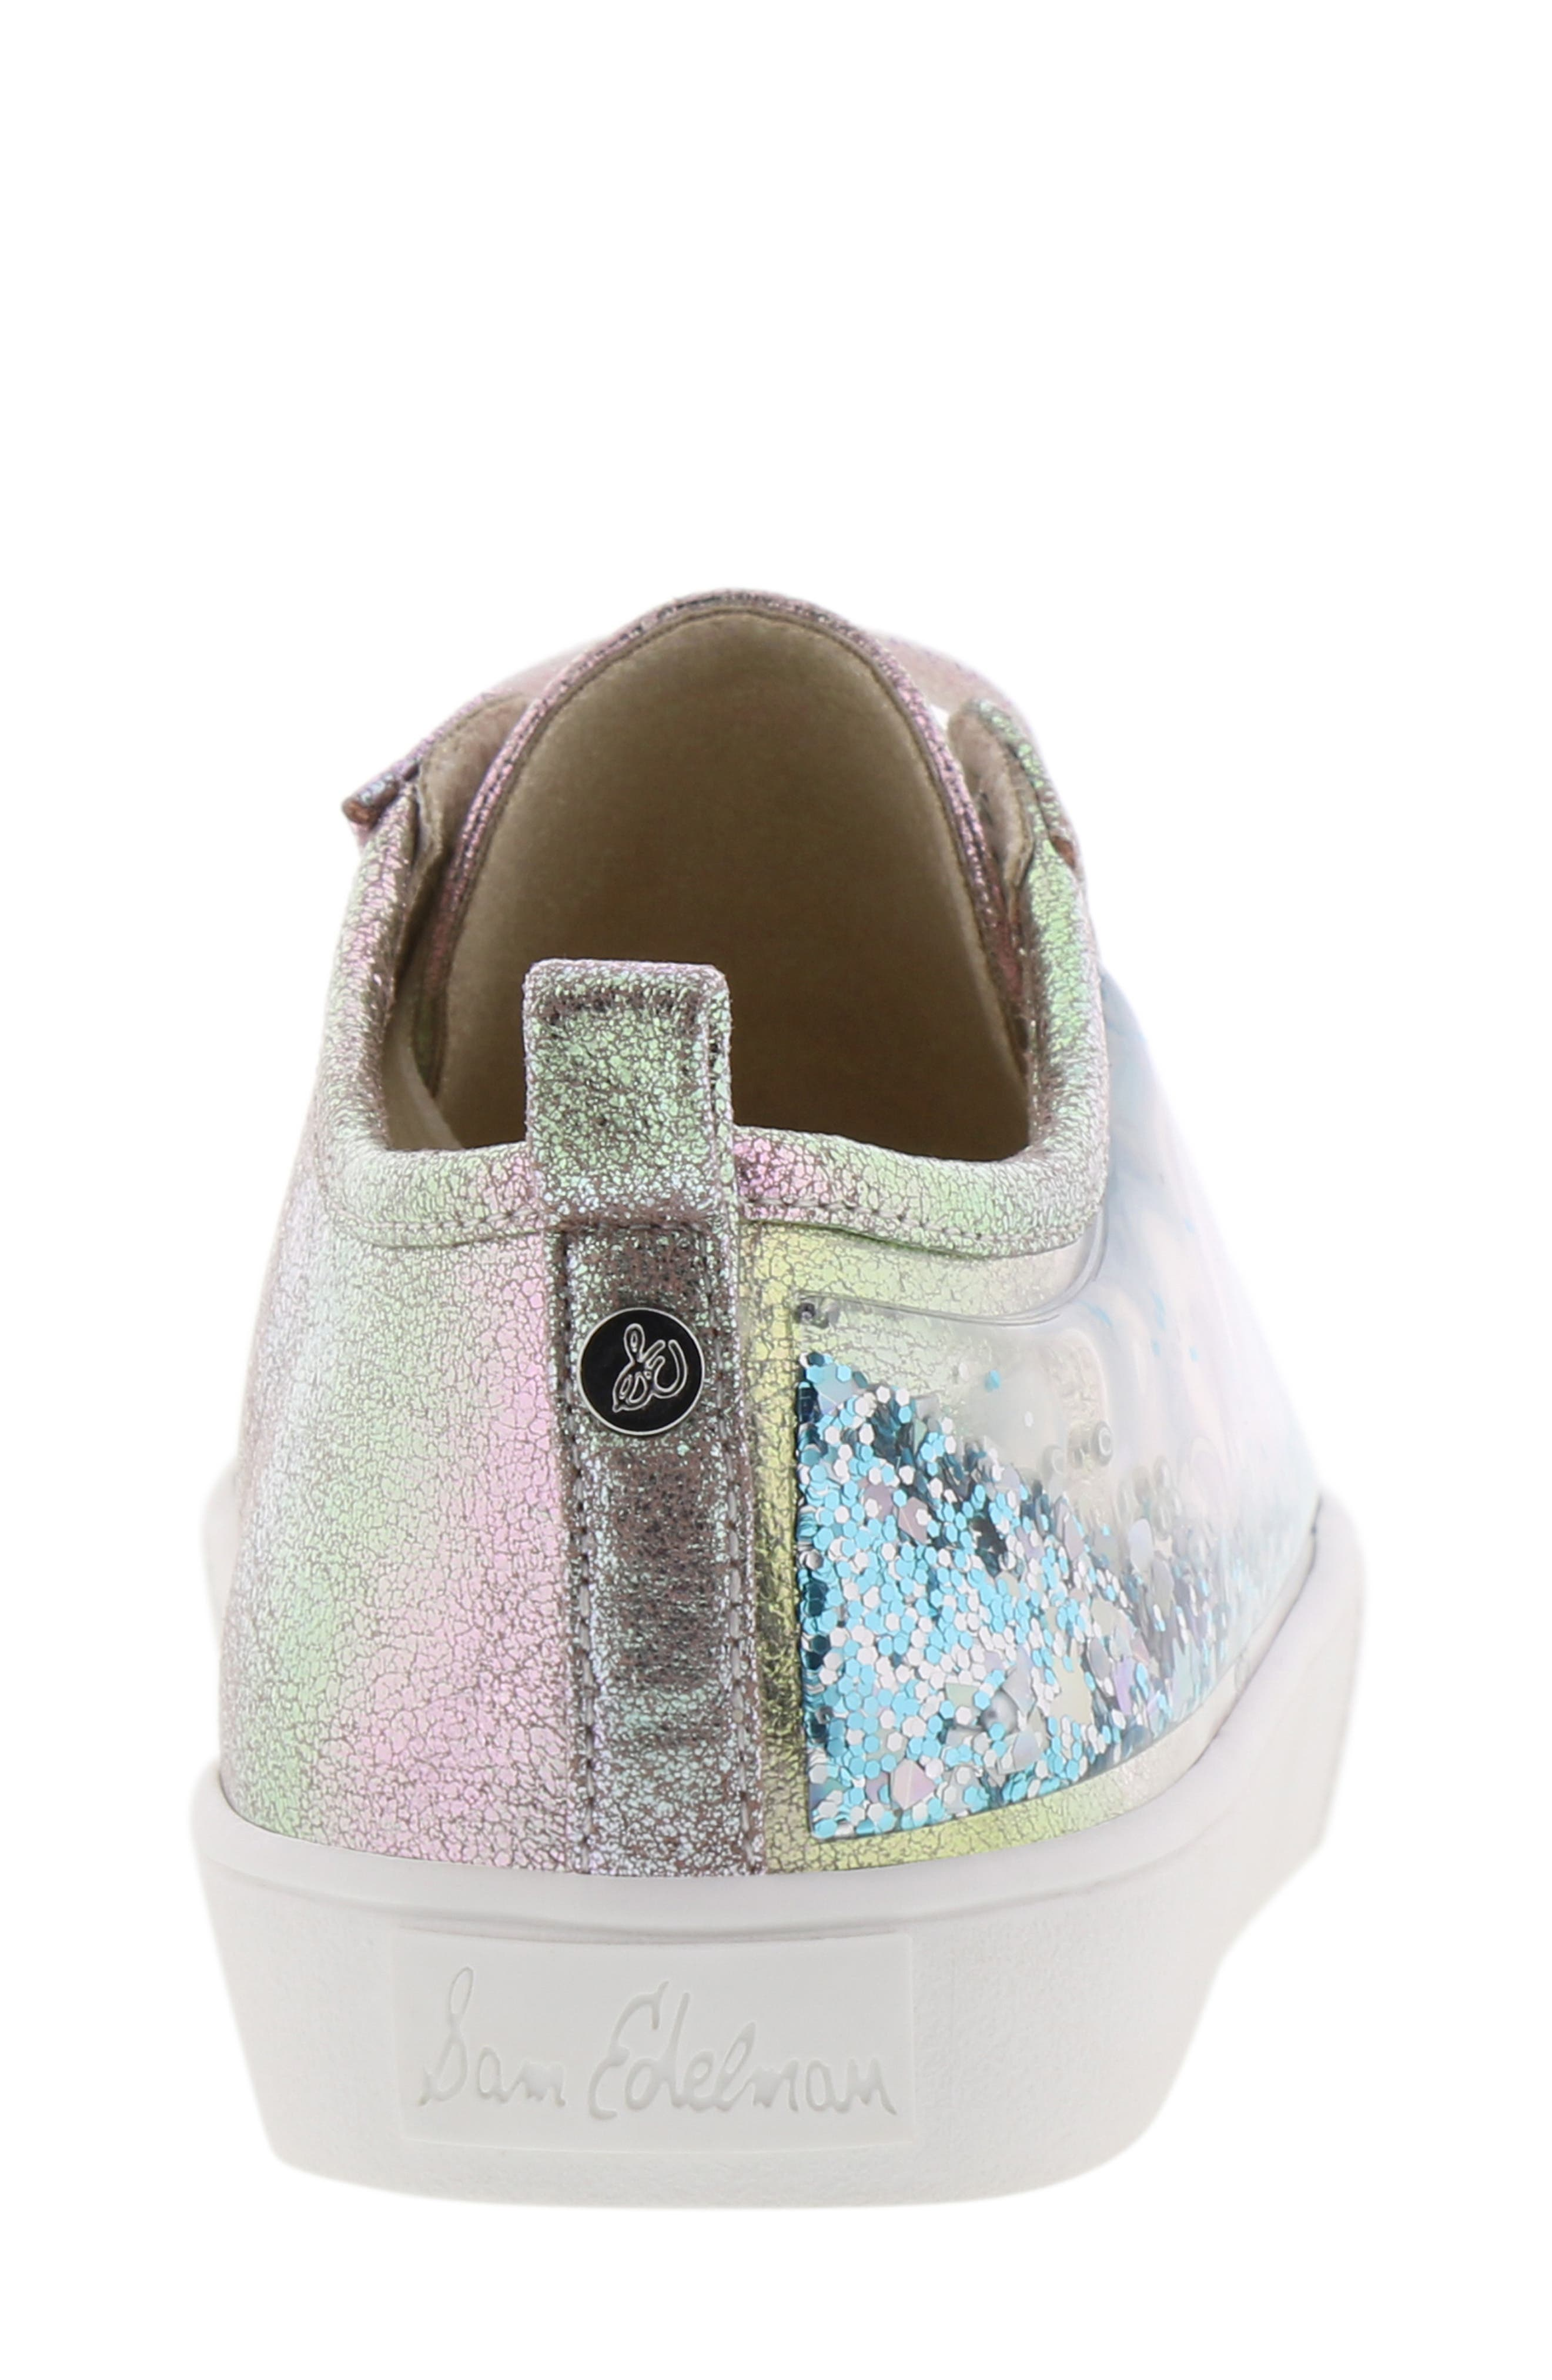 Bella Aqua Slip-On Sneaker,                             Alternate thumbnail 7, color,                             GASOLINE IRIDESCENT